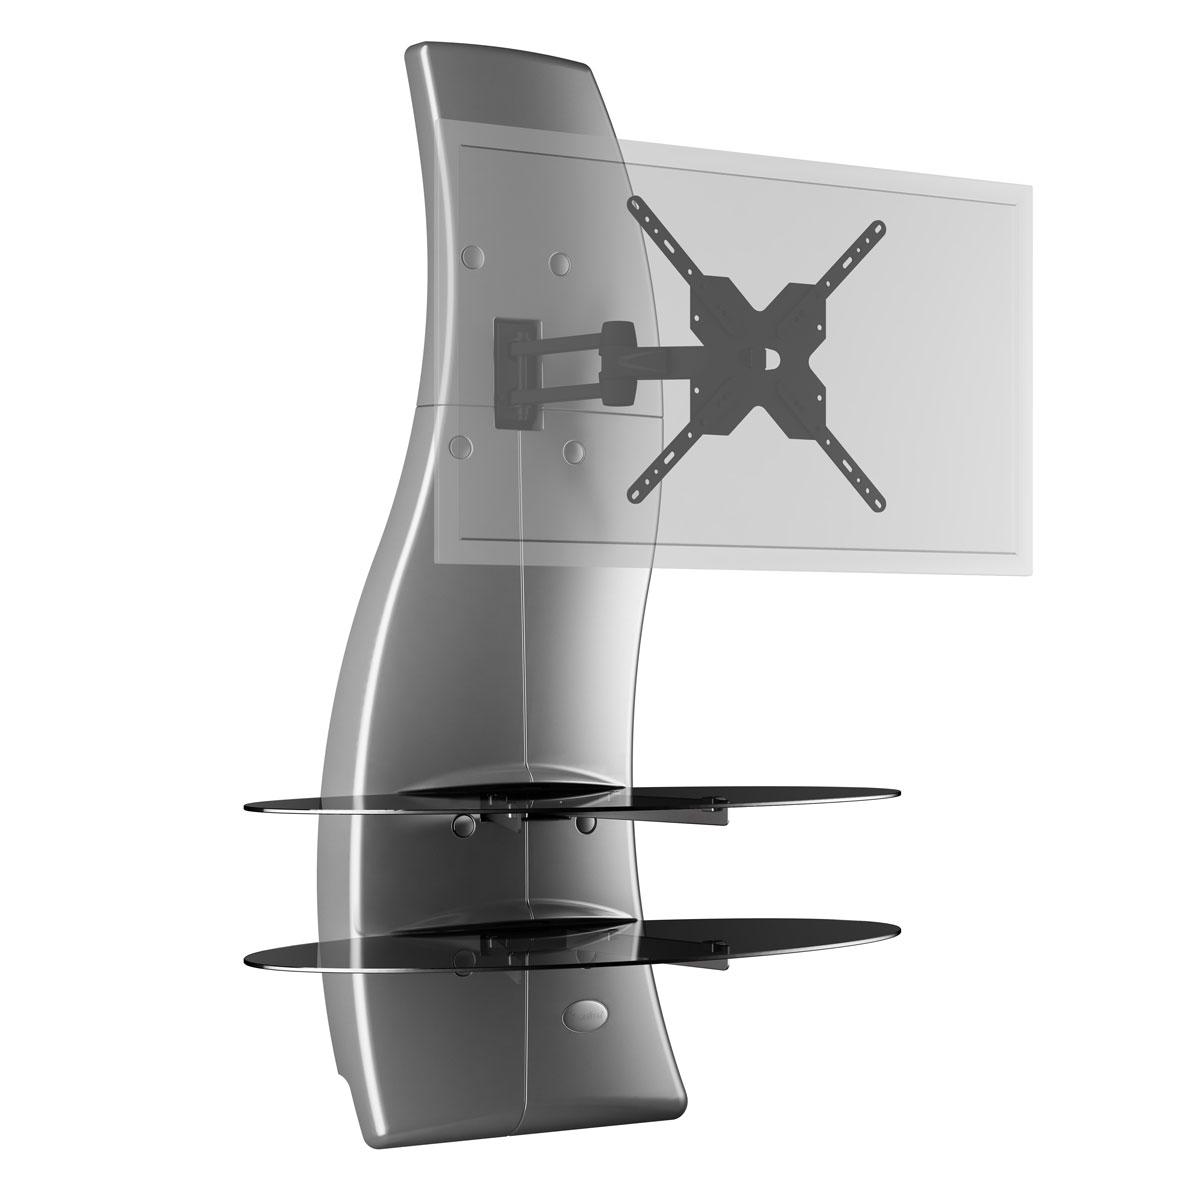 meliconi ghost design 2000 rotation argent meuble tv meliconi sur ldlc. Black Bedroom Furniture Sets. Home Design Ideas